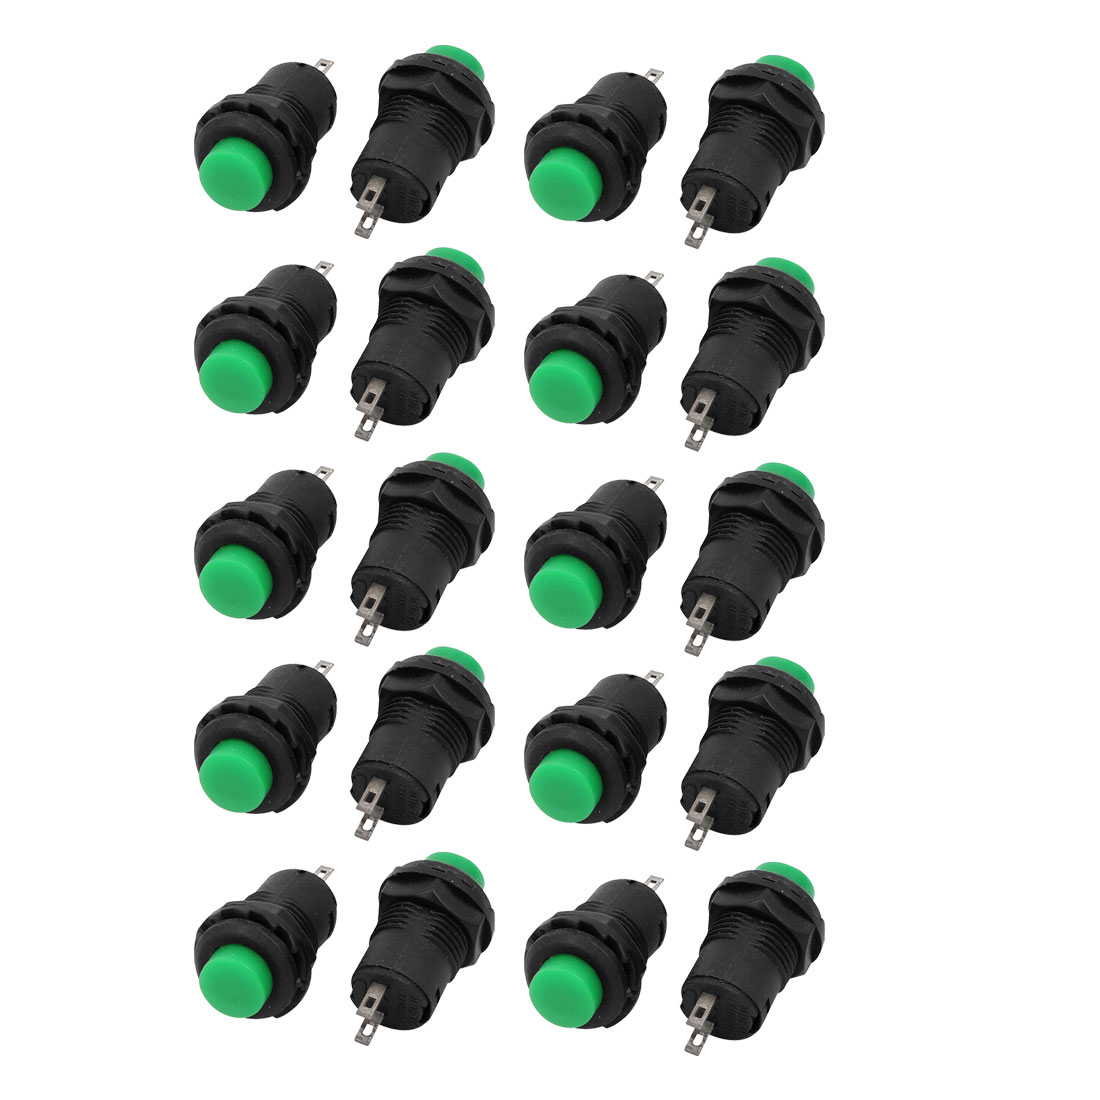 20Pcs Green Round Cap AC 3A/125V 1.5A/250V NO SPST Momentary Push Button Switch